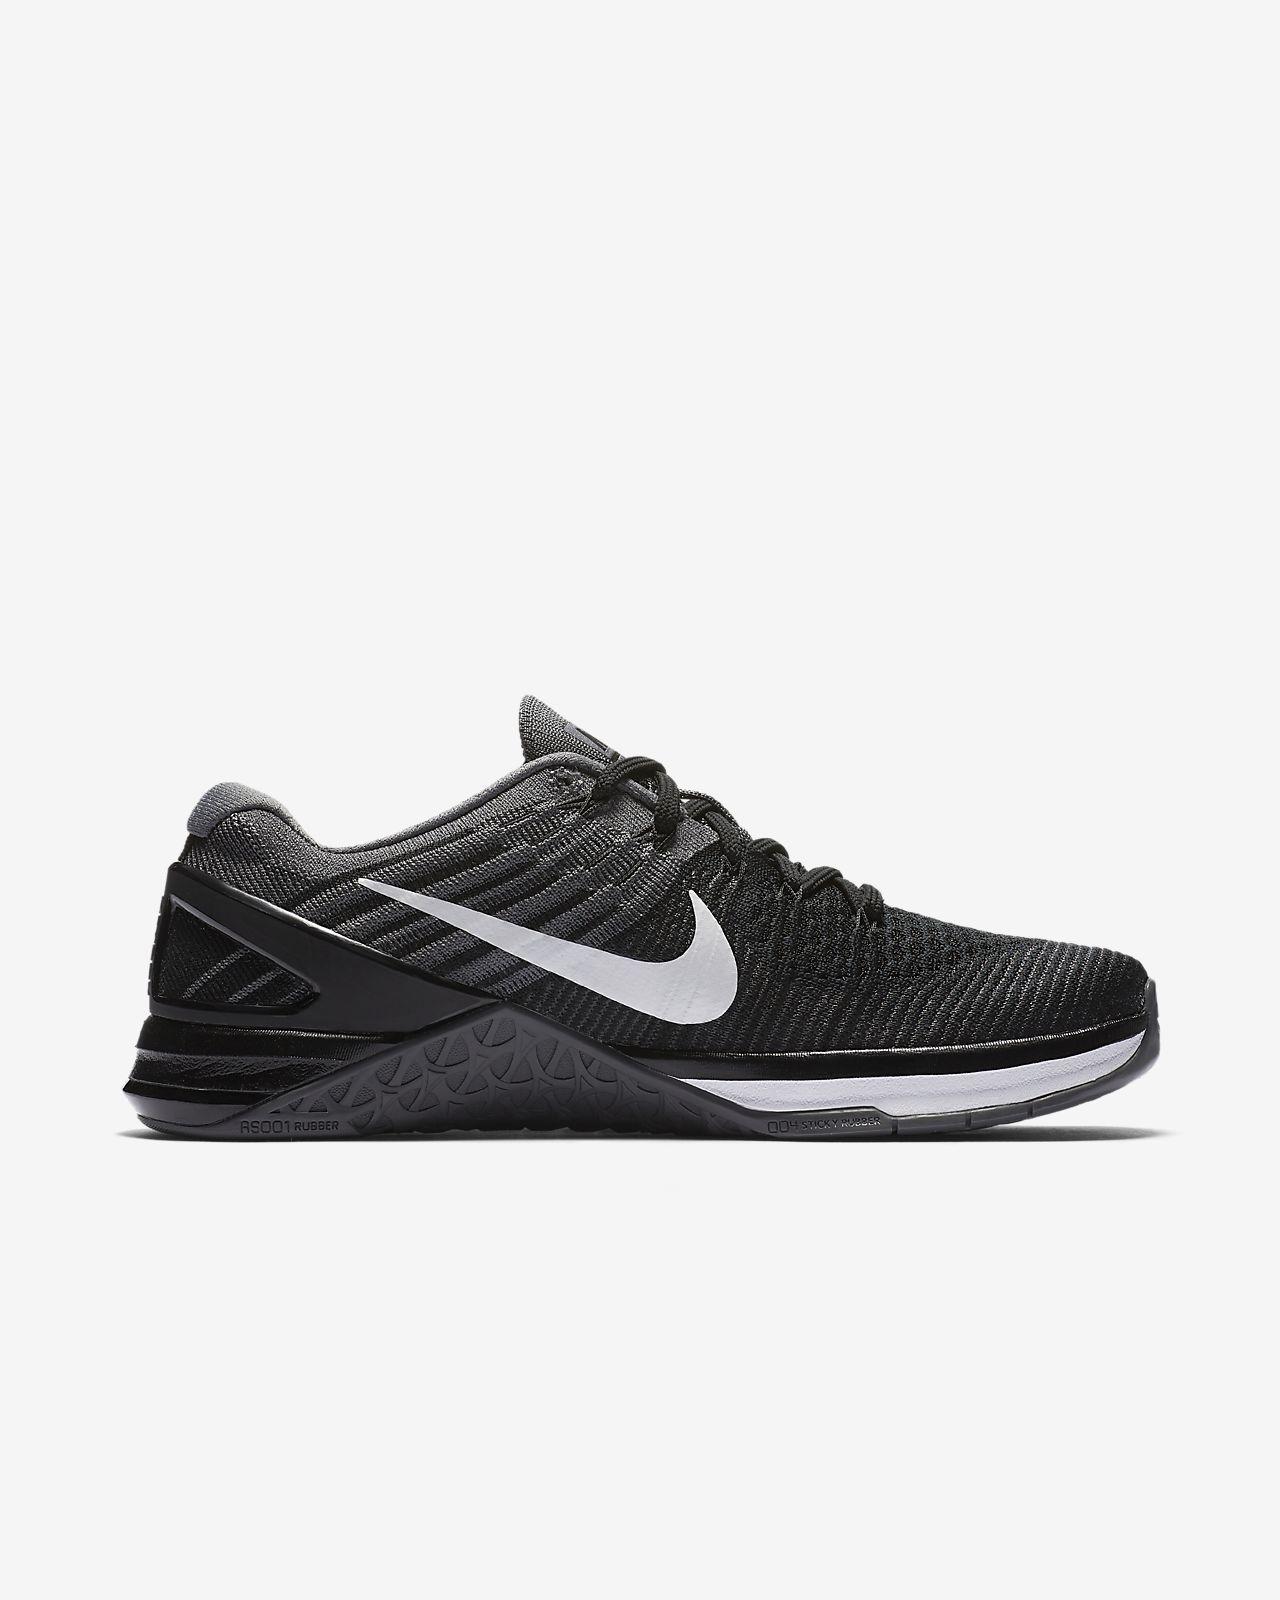 Nike - Metcon DSX Flyknit 2 Damen Trainingsschuh (schwarz/weiß) - EU 36 - US 5,5